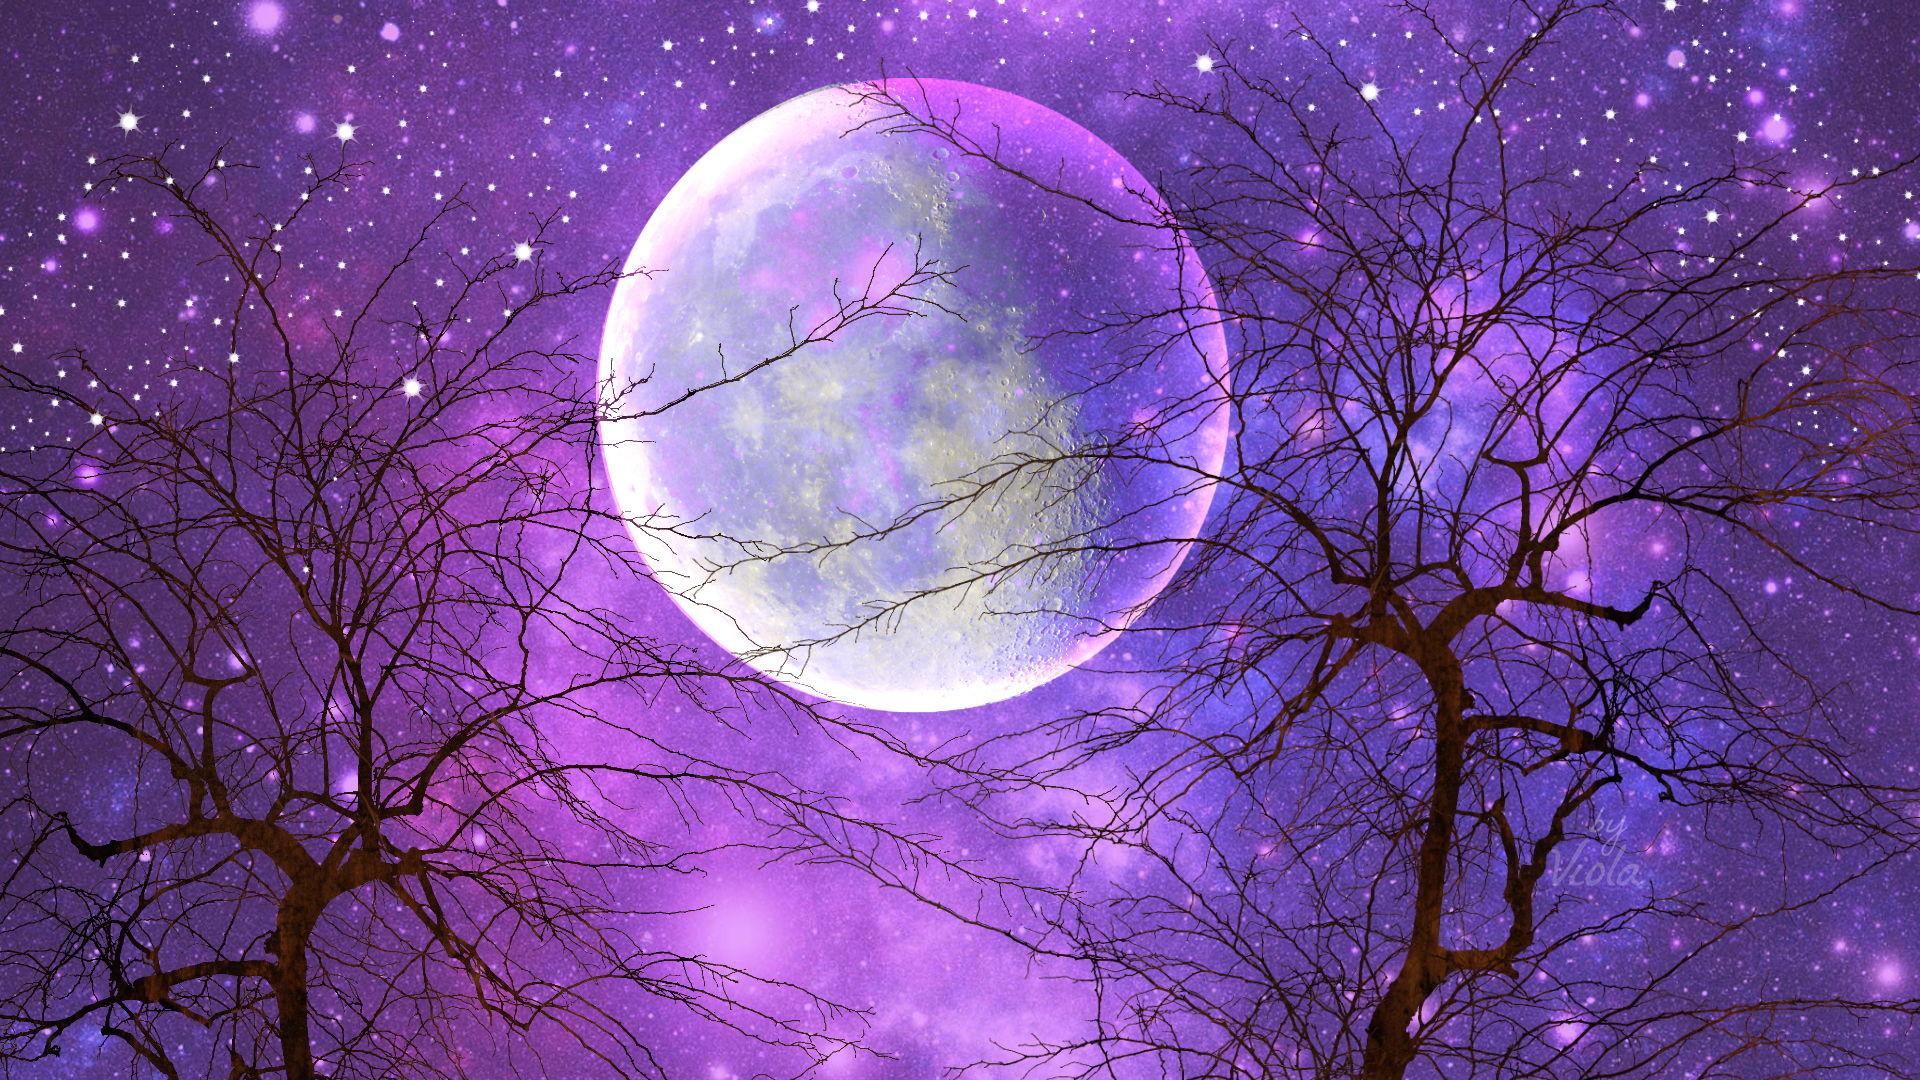 Artistic – Moon Artistic Sky Purple Starry Sky Tree Wallpaper